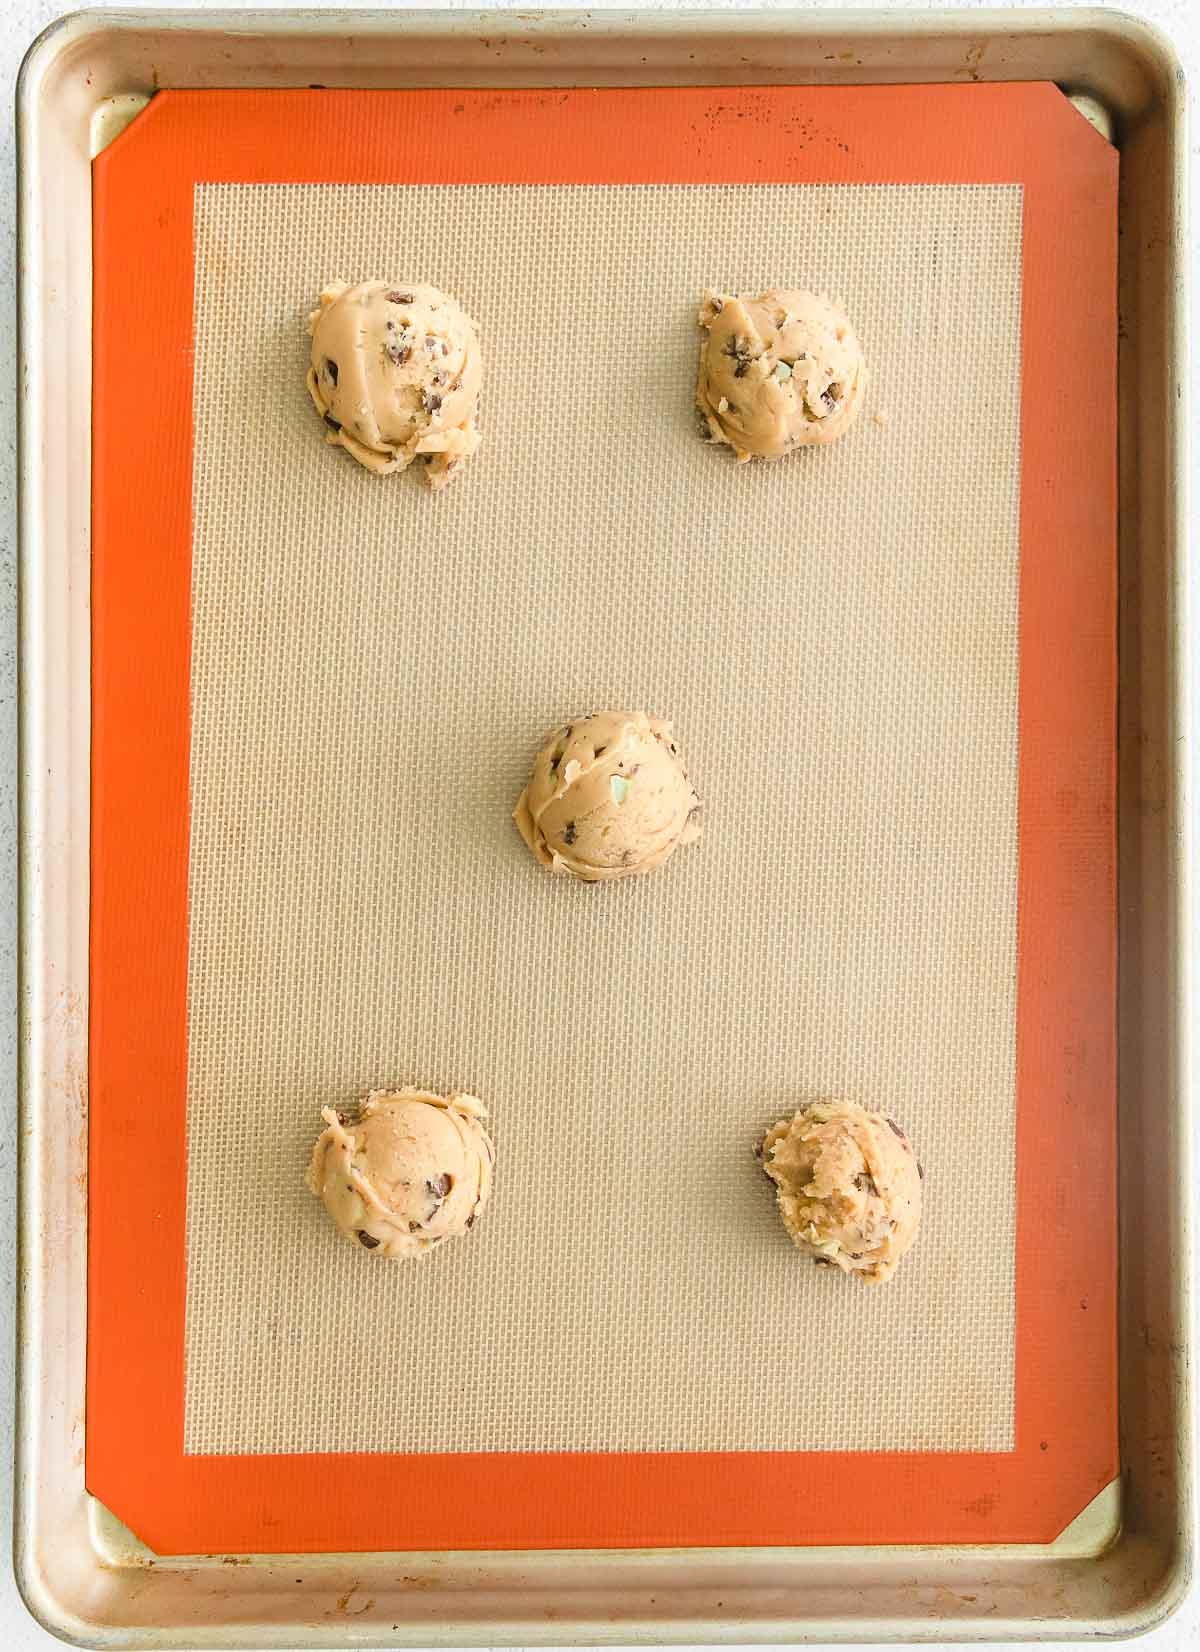 dough balls on pan